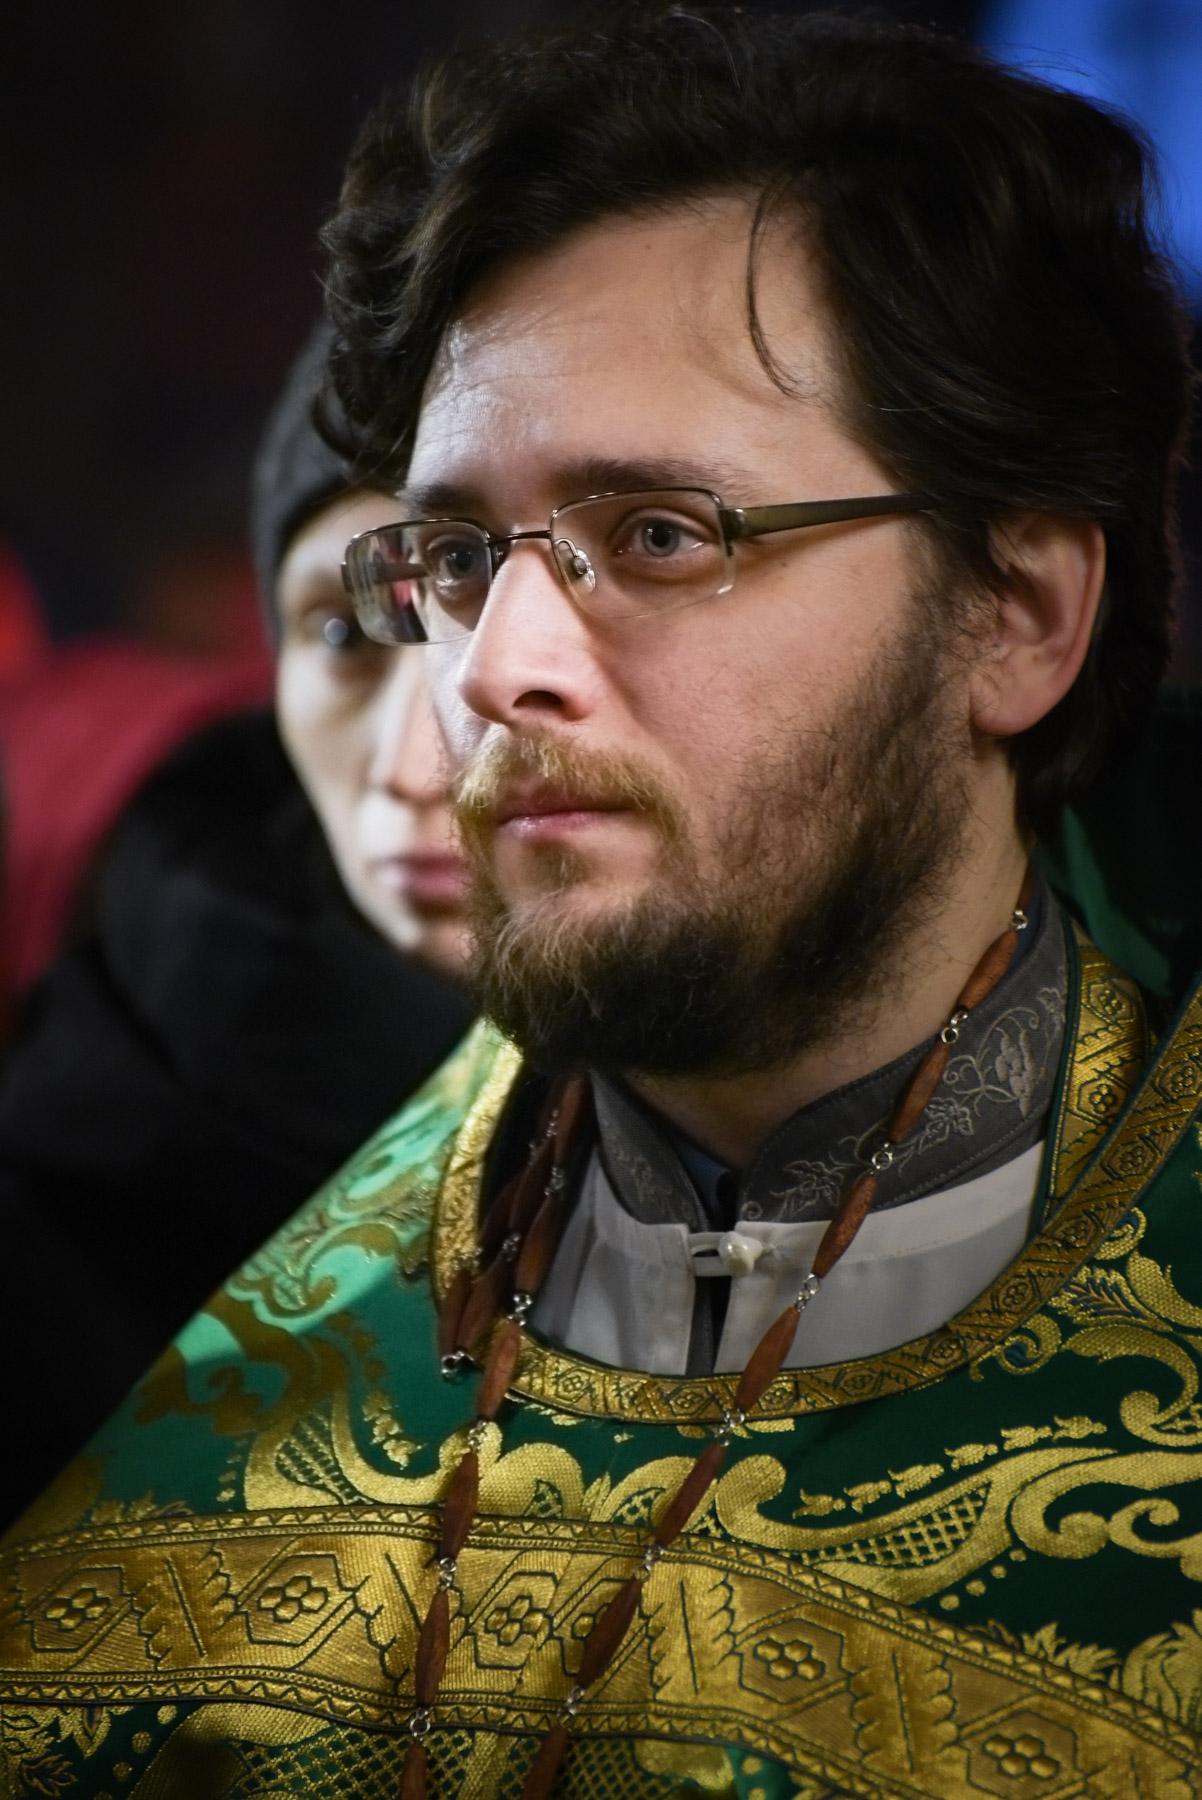 photos of orthodox christmas 0089 2